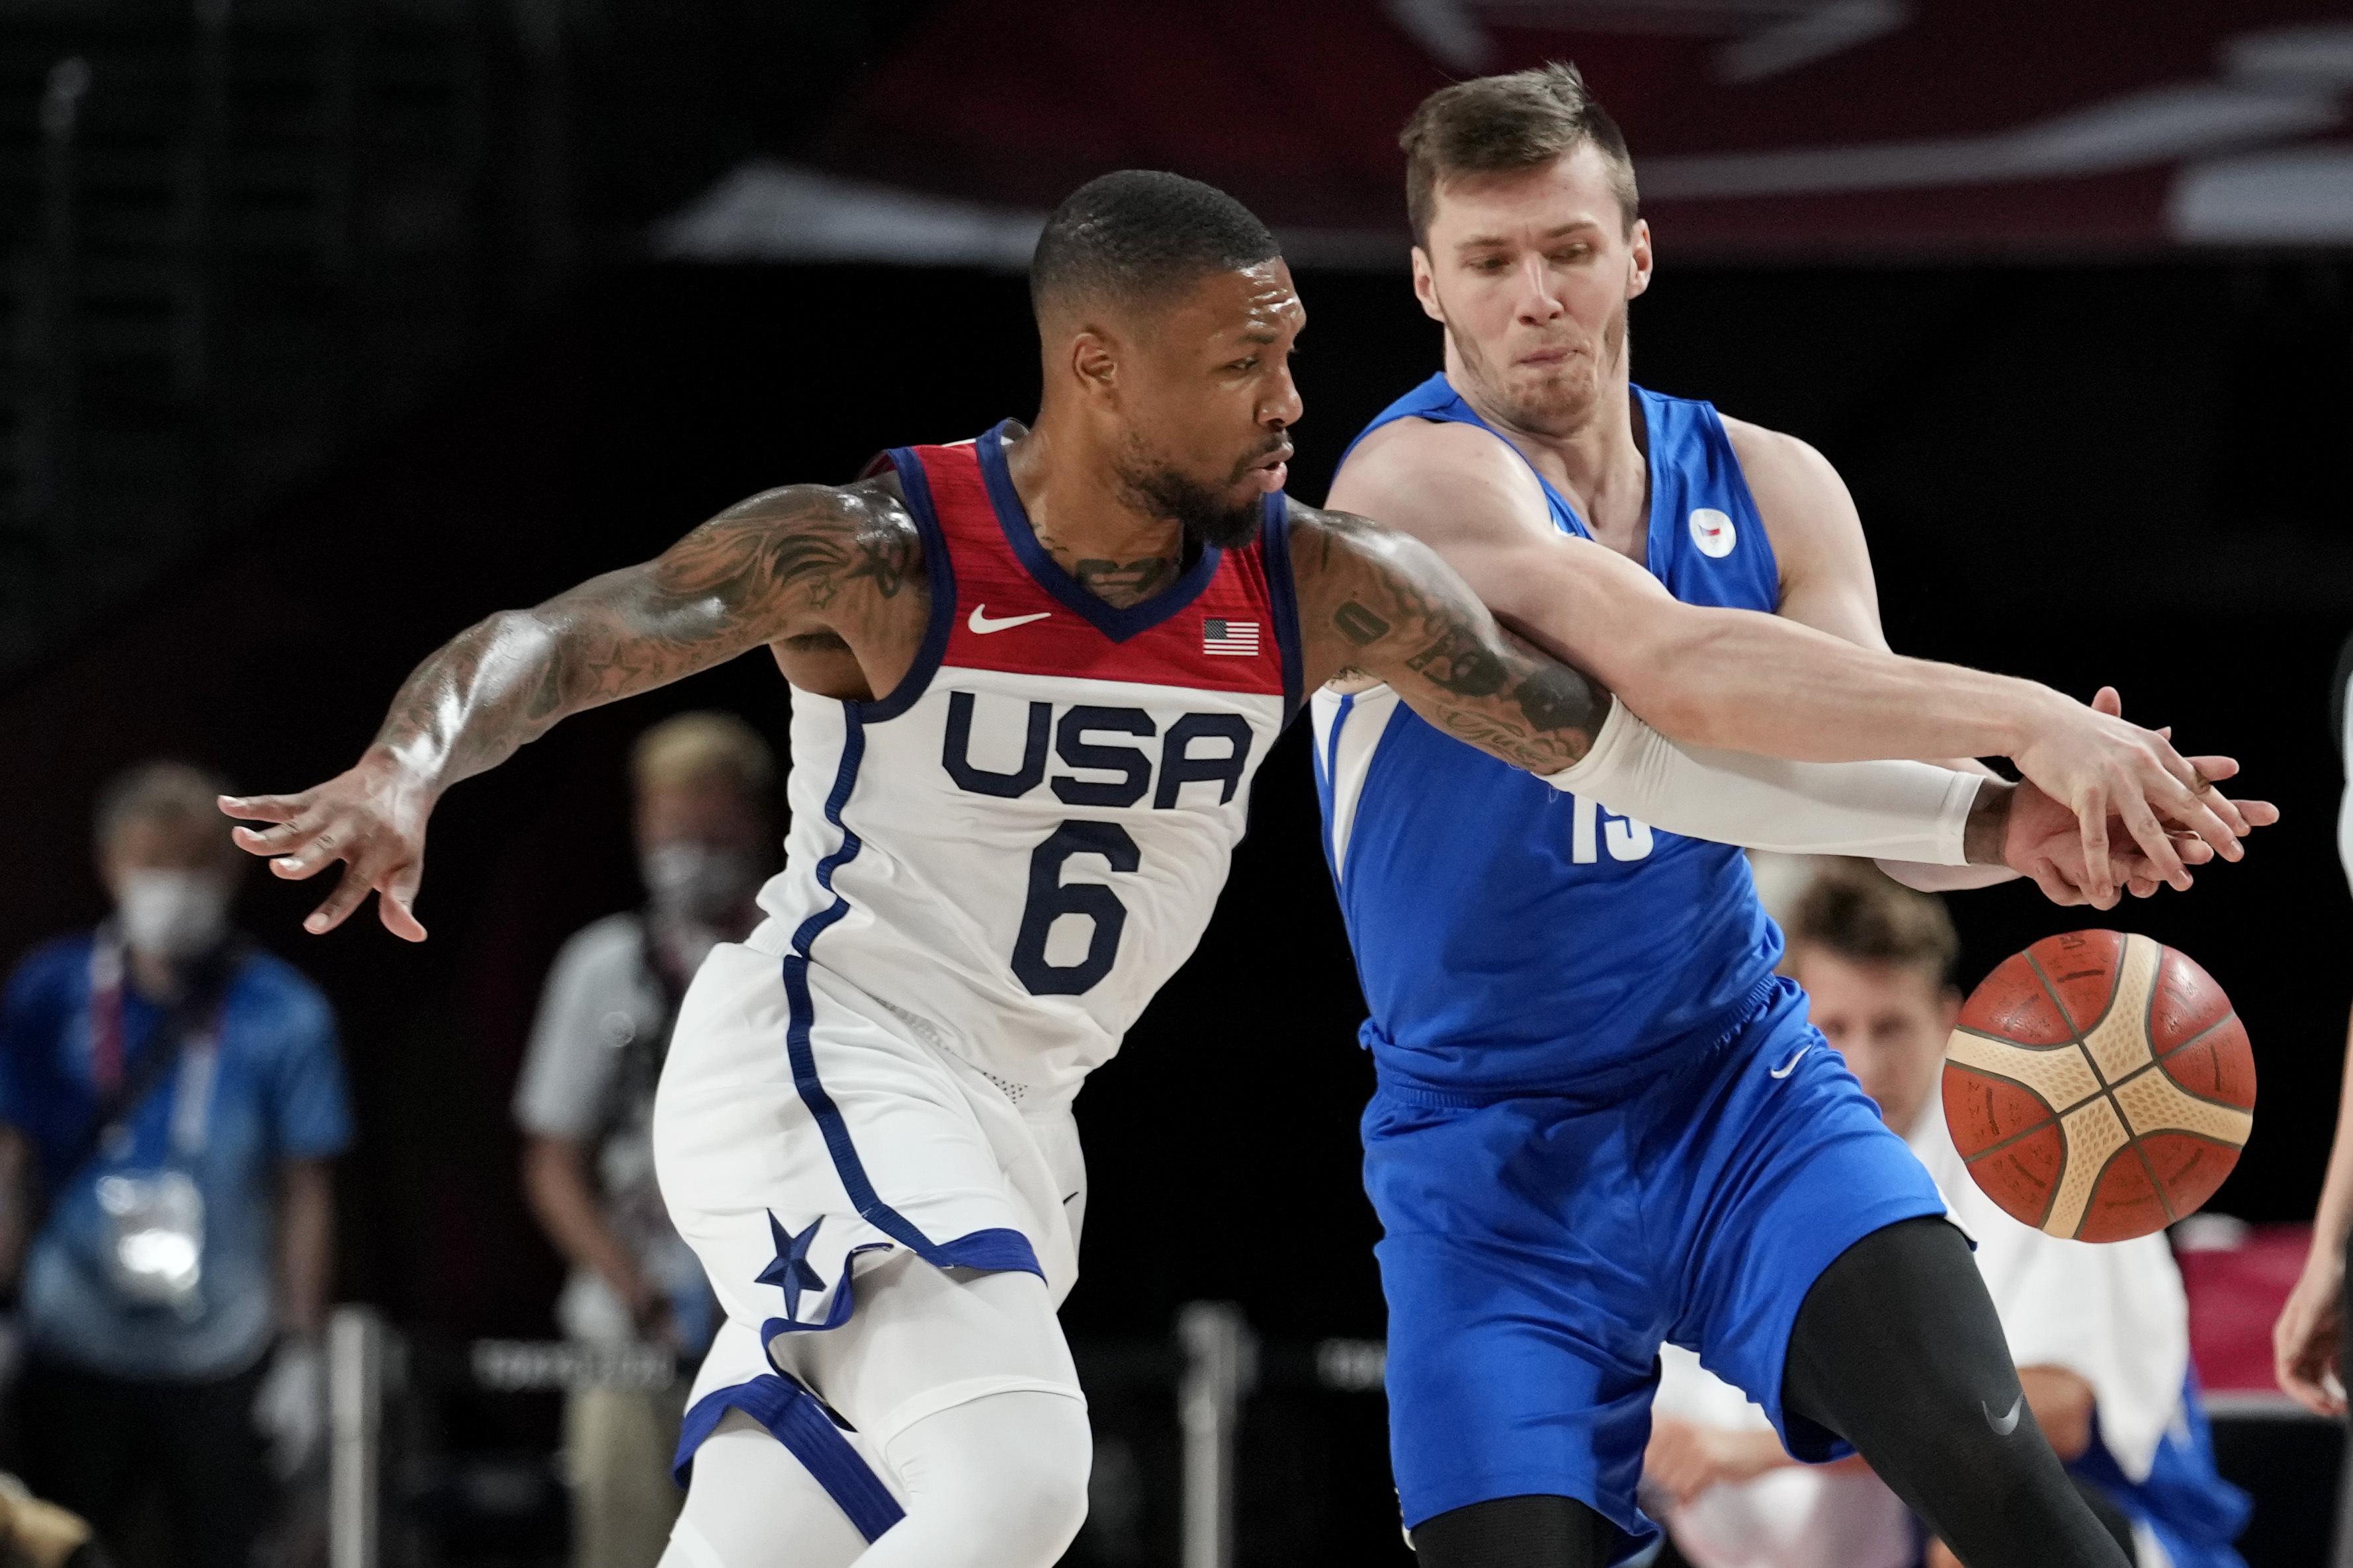 United States's Damian Lillard steals the ball from Czech Republic's Martin Peterka